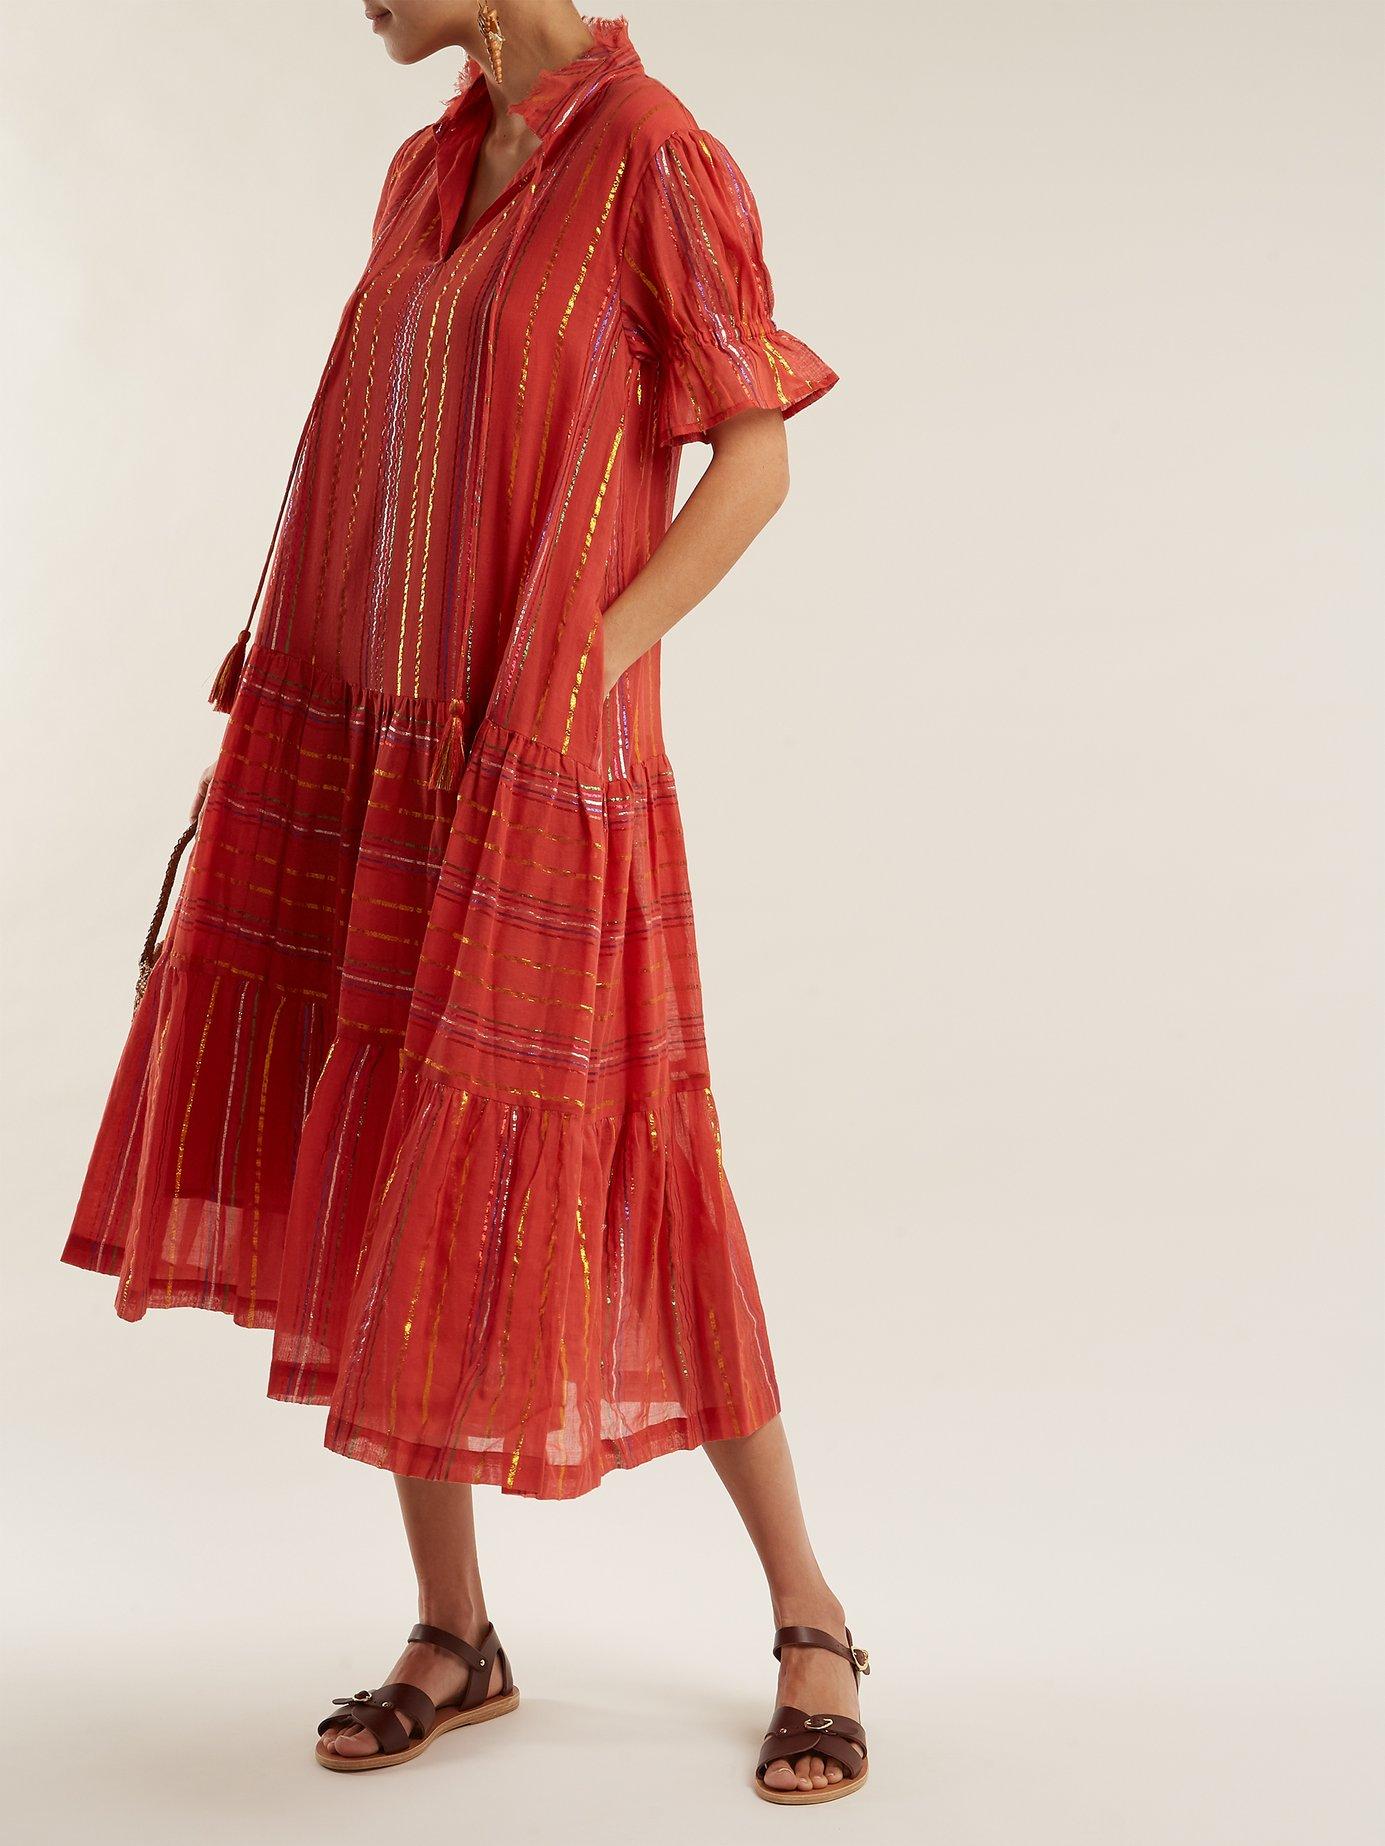 Los Altos striped cotton-blend dress by Apiece Apart